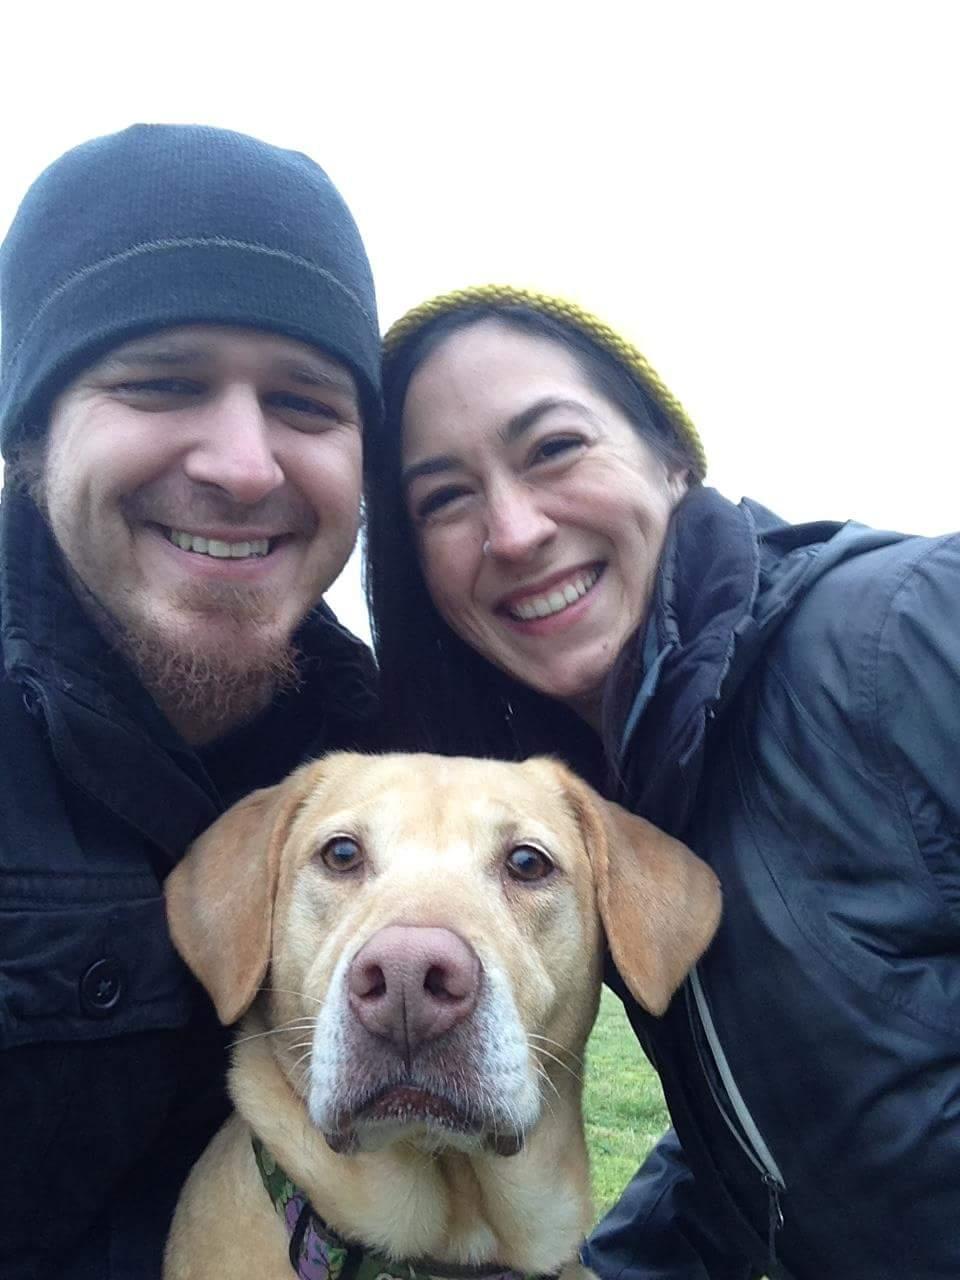 Krisha, with her husband, Greg, and their dog, Roxie